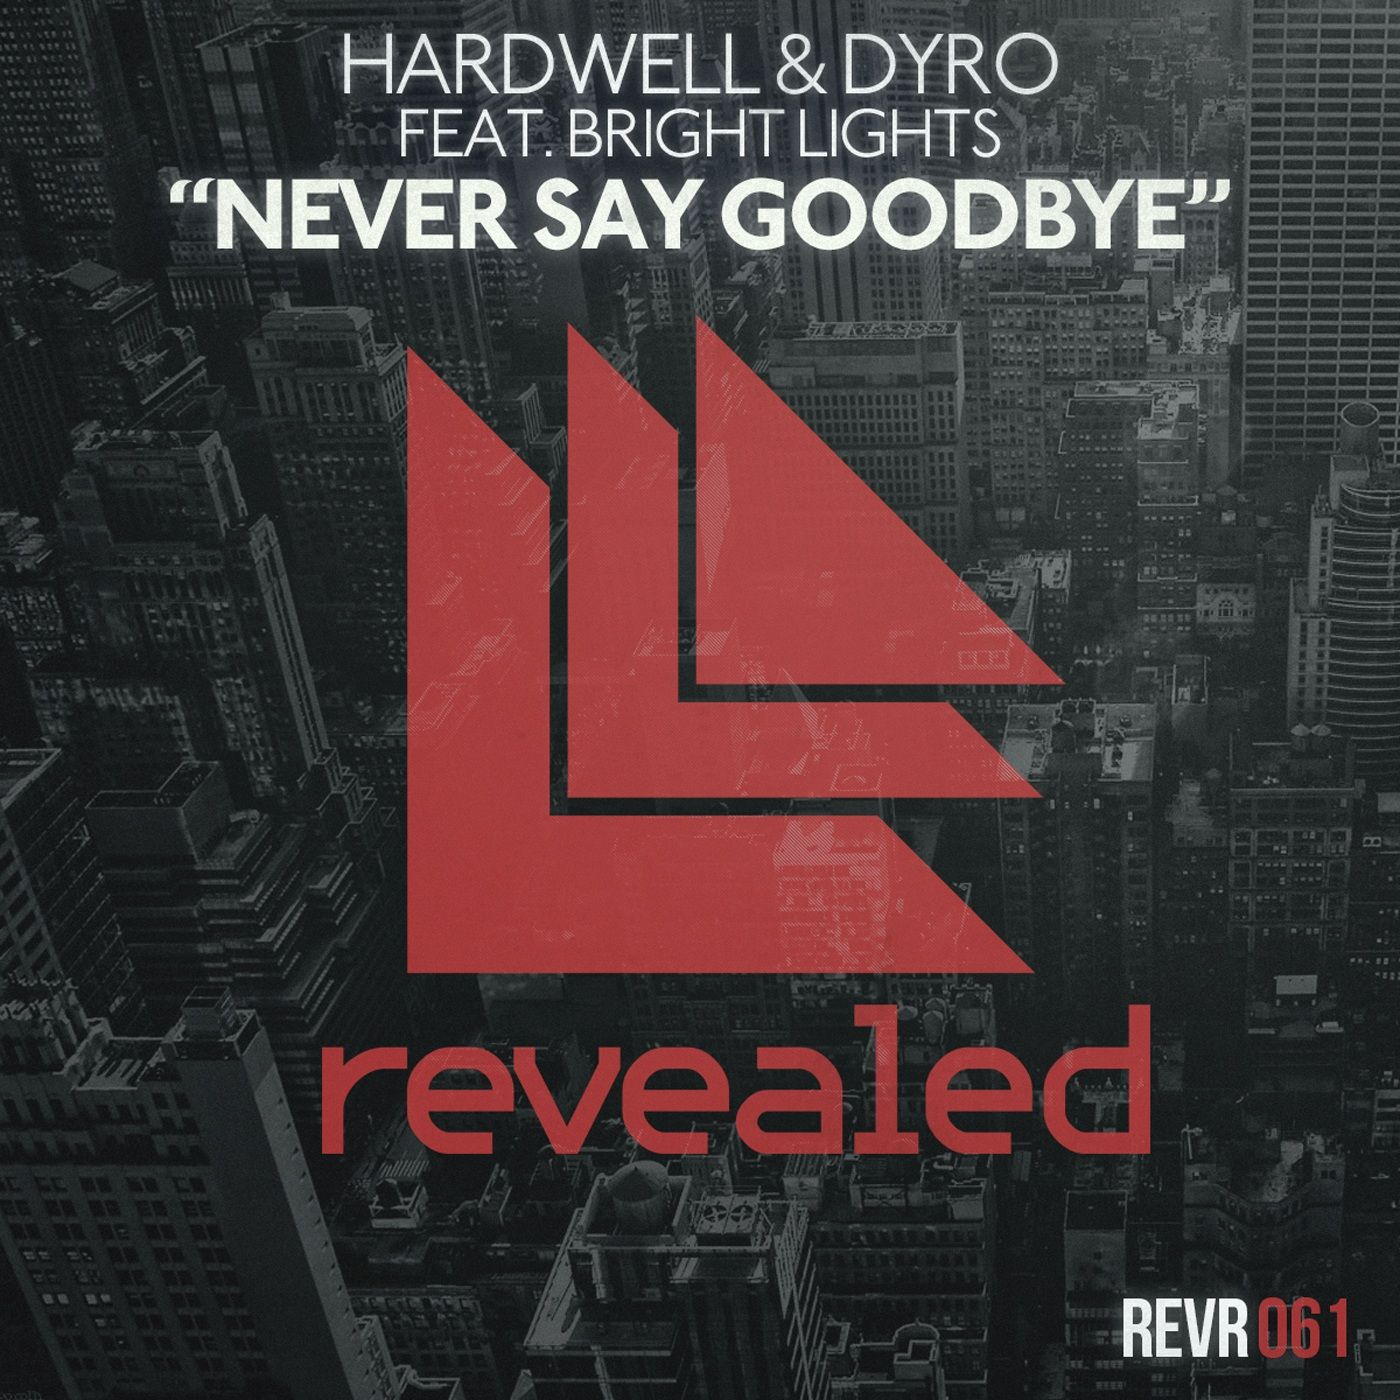 Hardwell, Dyro, Bright Lights – Never Say Goodbye (single cover art)